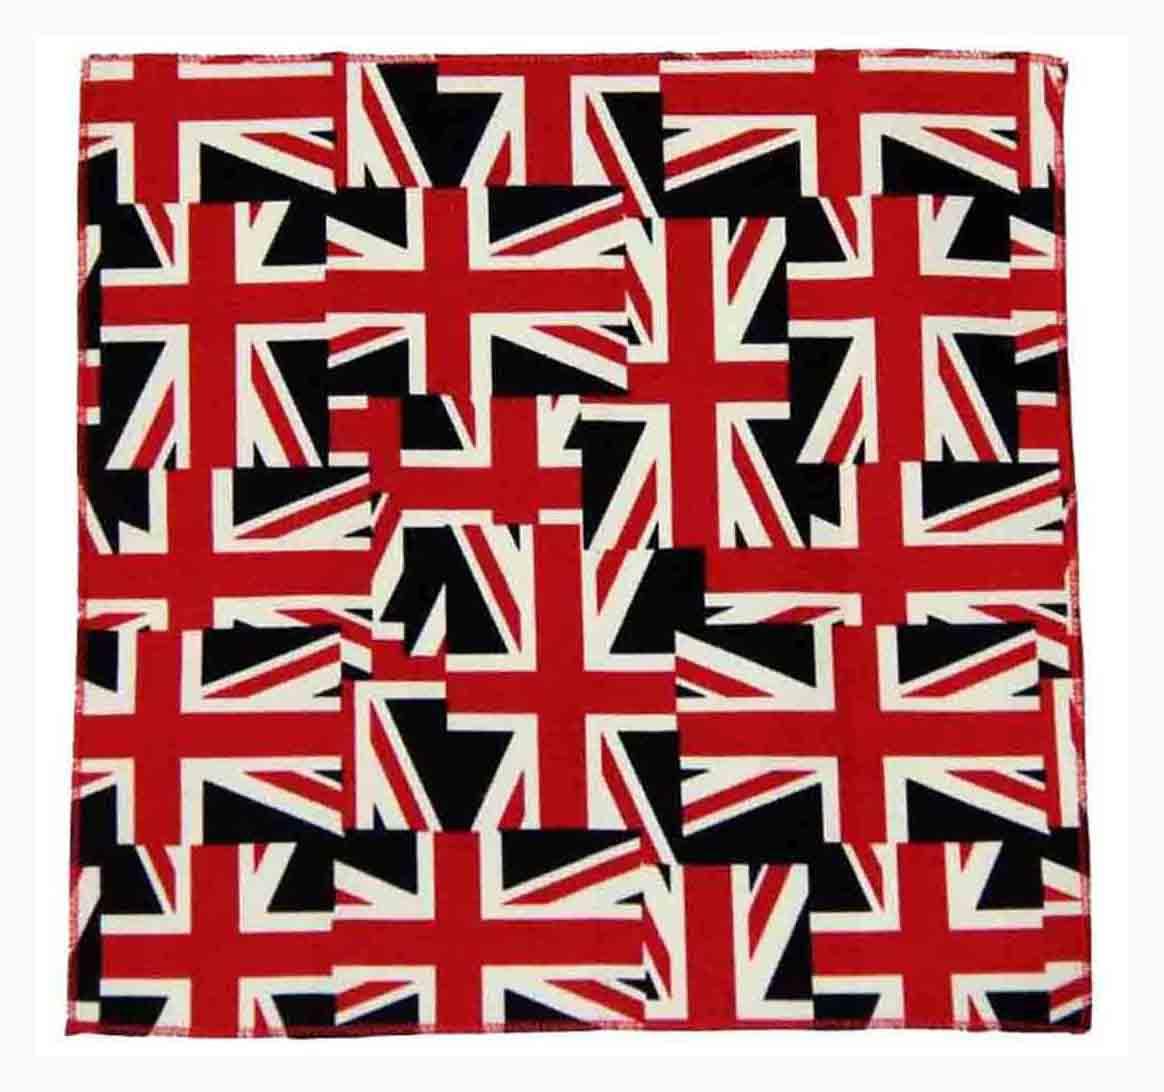 Gascoigne Pocket Square British Union Jack Flag Pattern Cotton Red White Blue Men's